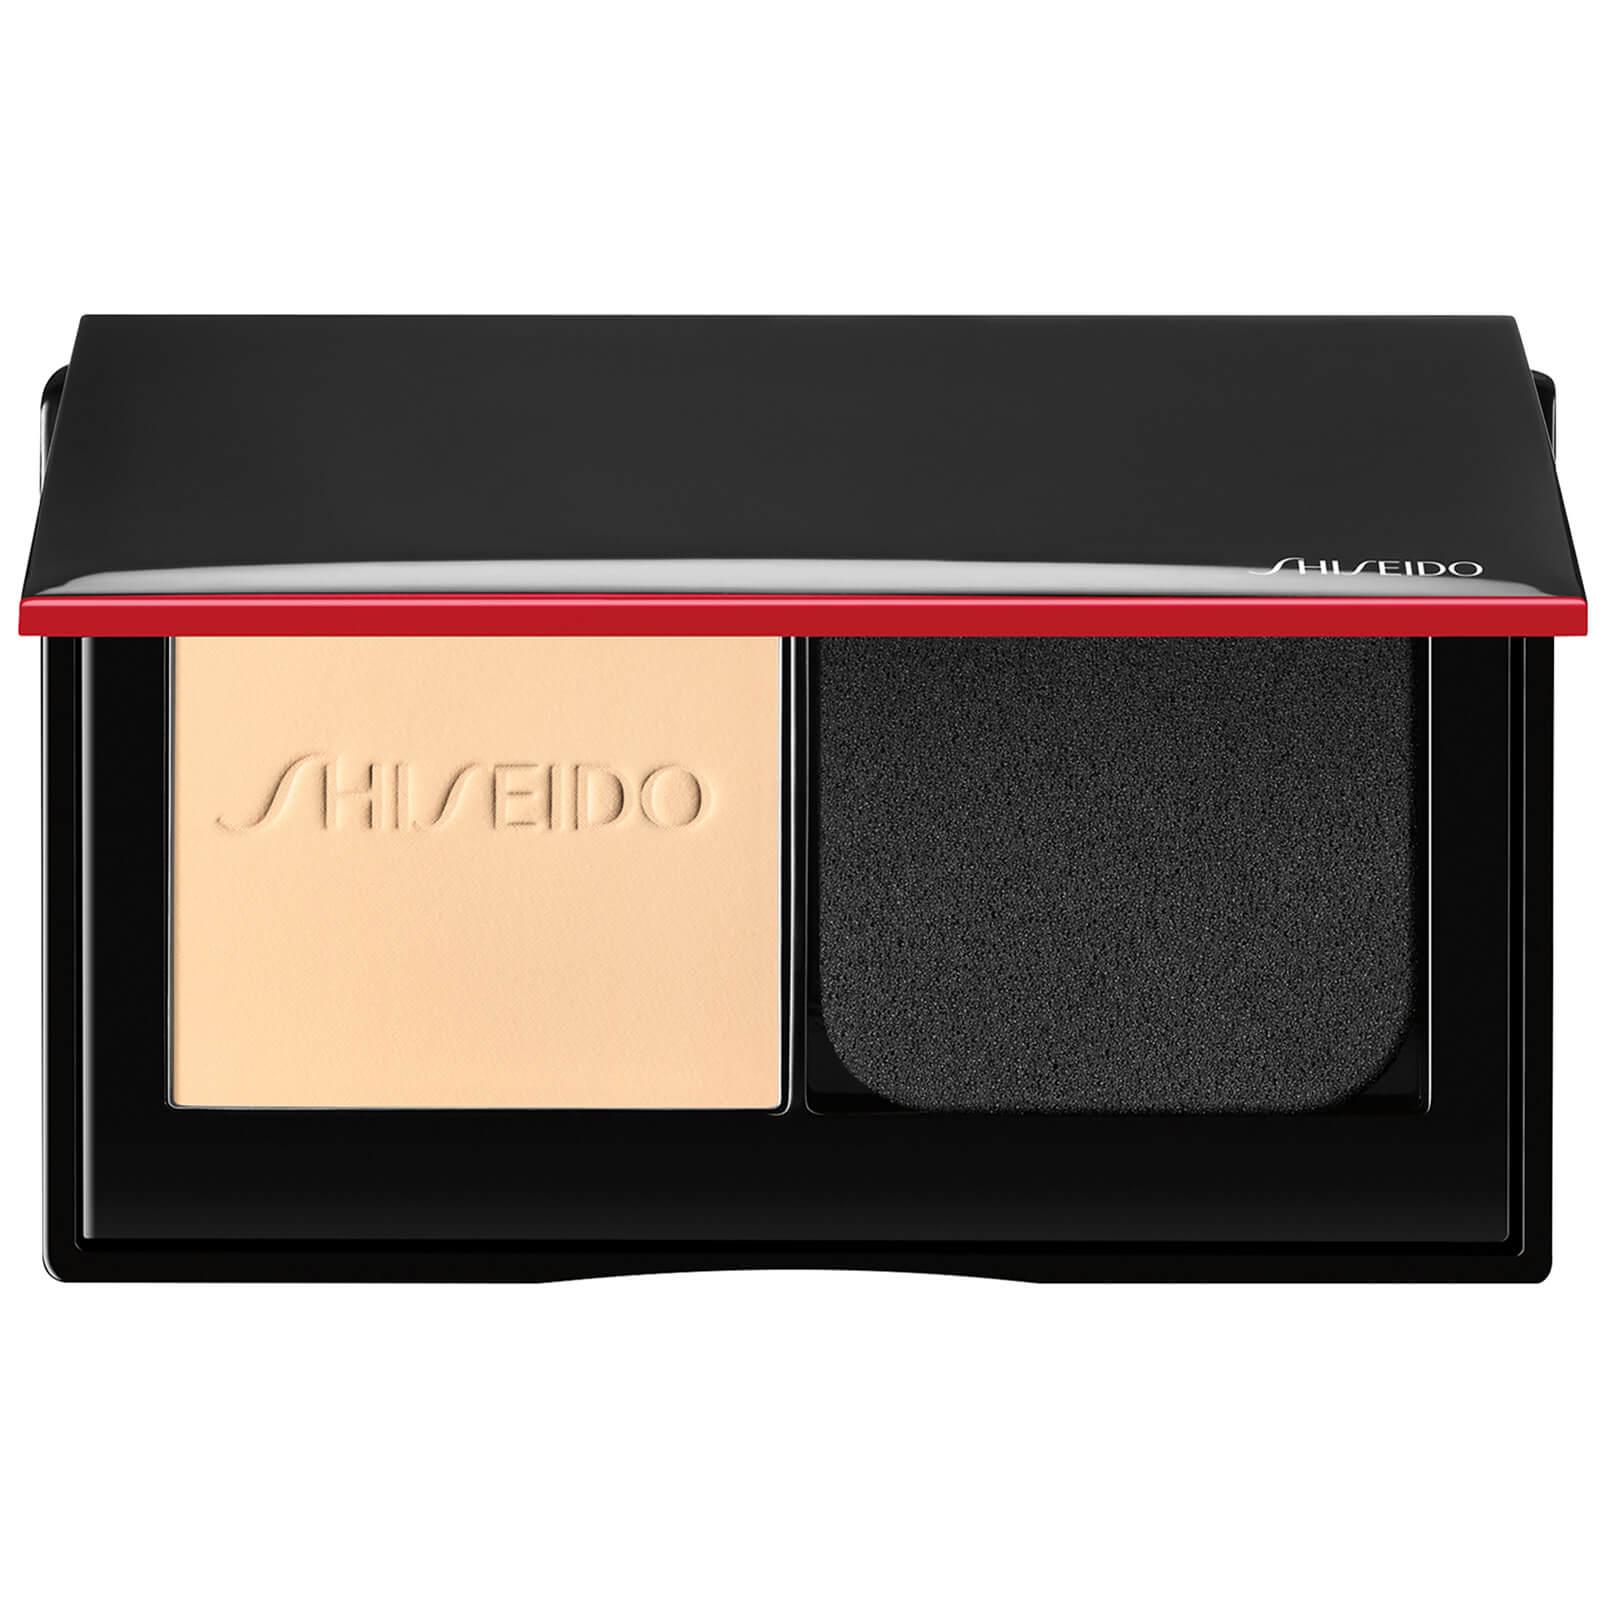 Shiseido Synchro Skin Self-Refreshing Custom Finish Powder Foundation 9g (Various Shades) - Alabaster